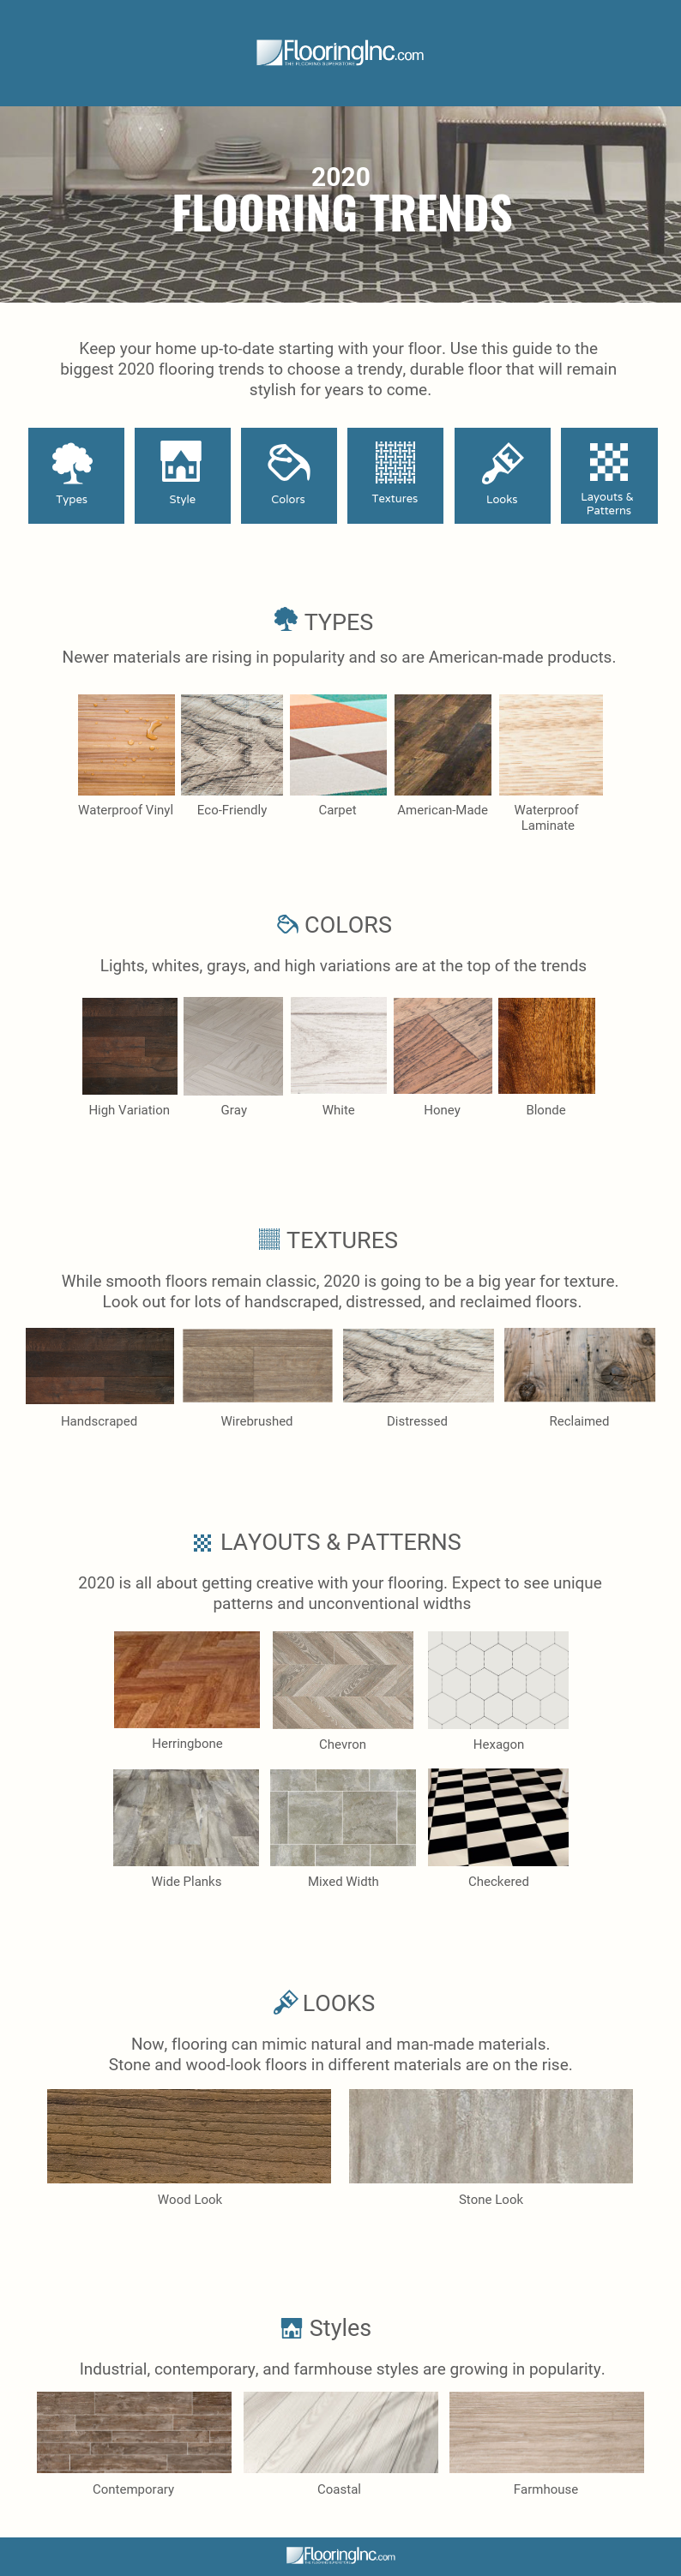 FlooringInc 2020 flooring trends charts